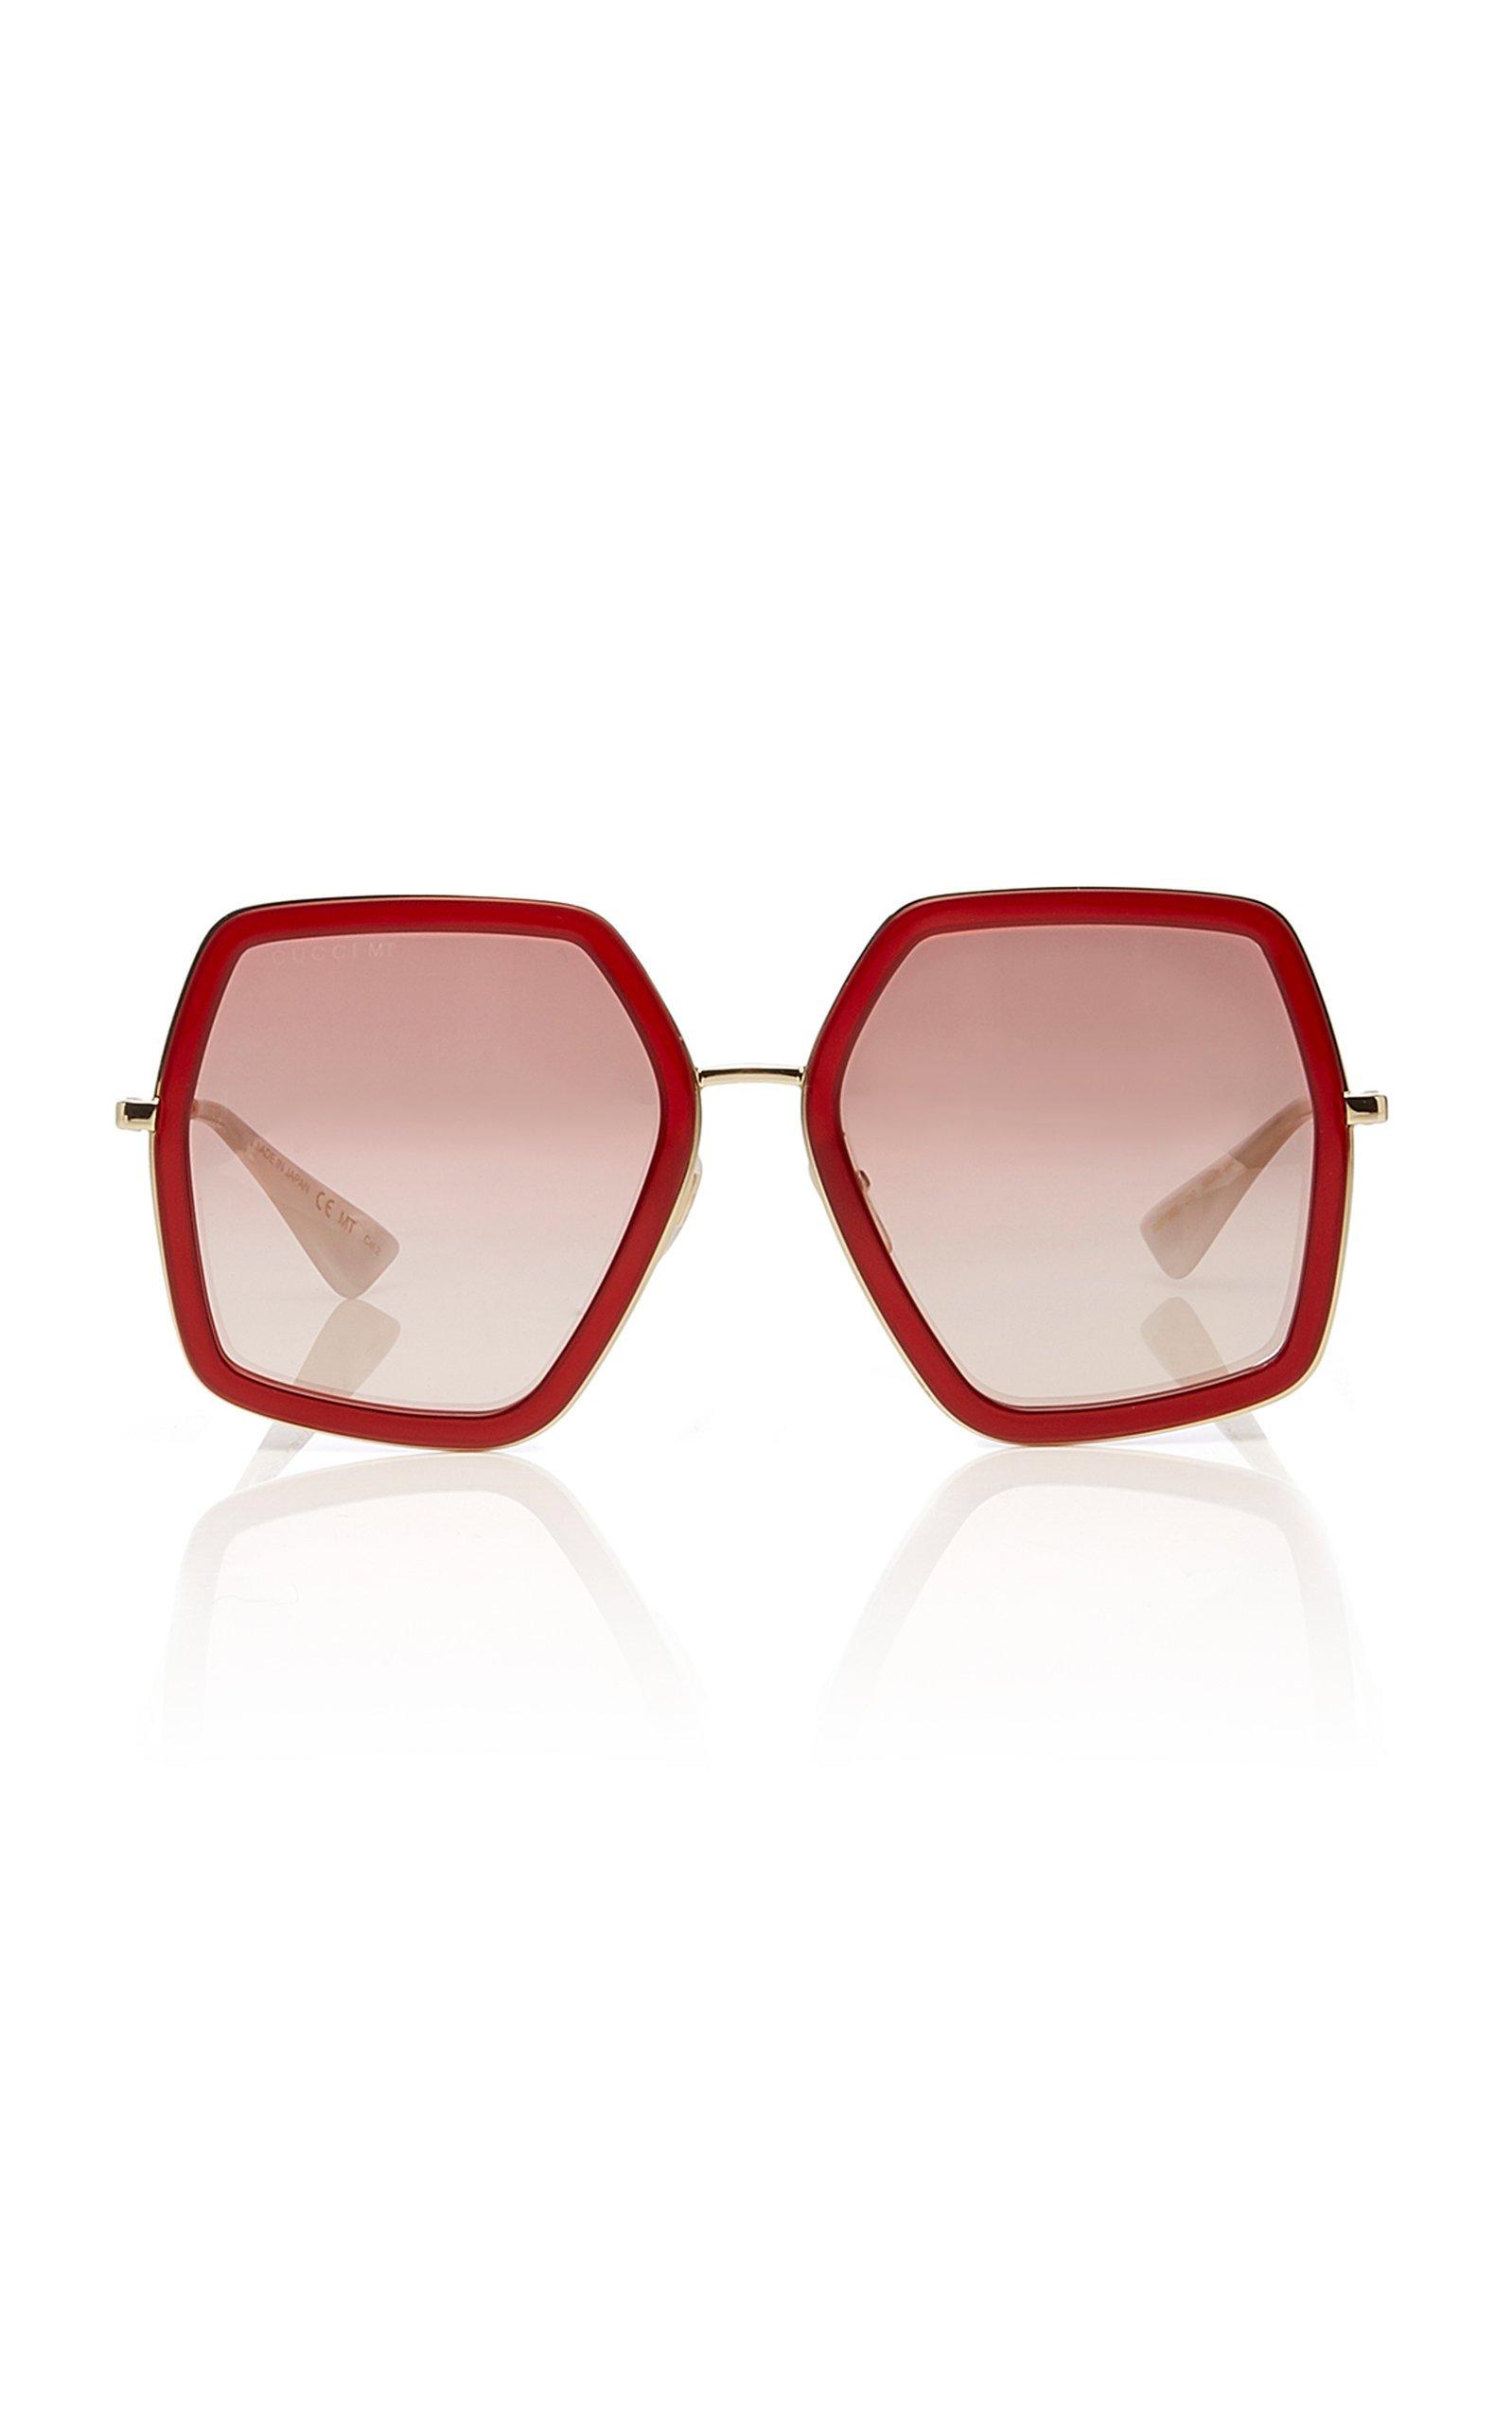 Hexagon-Frame Metal Sunglasses by Gucci Sunglasses | Moda Operandi